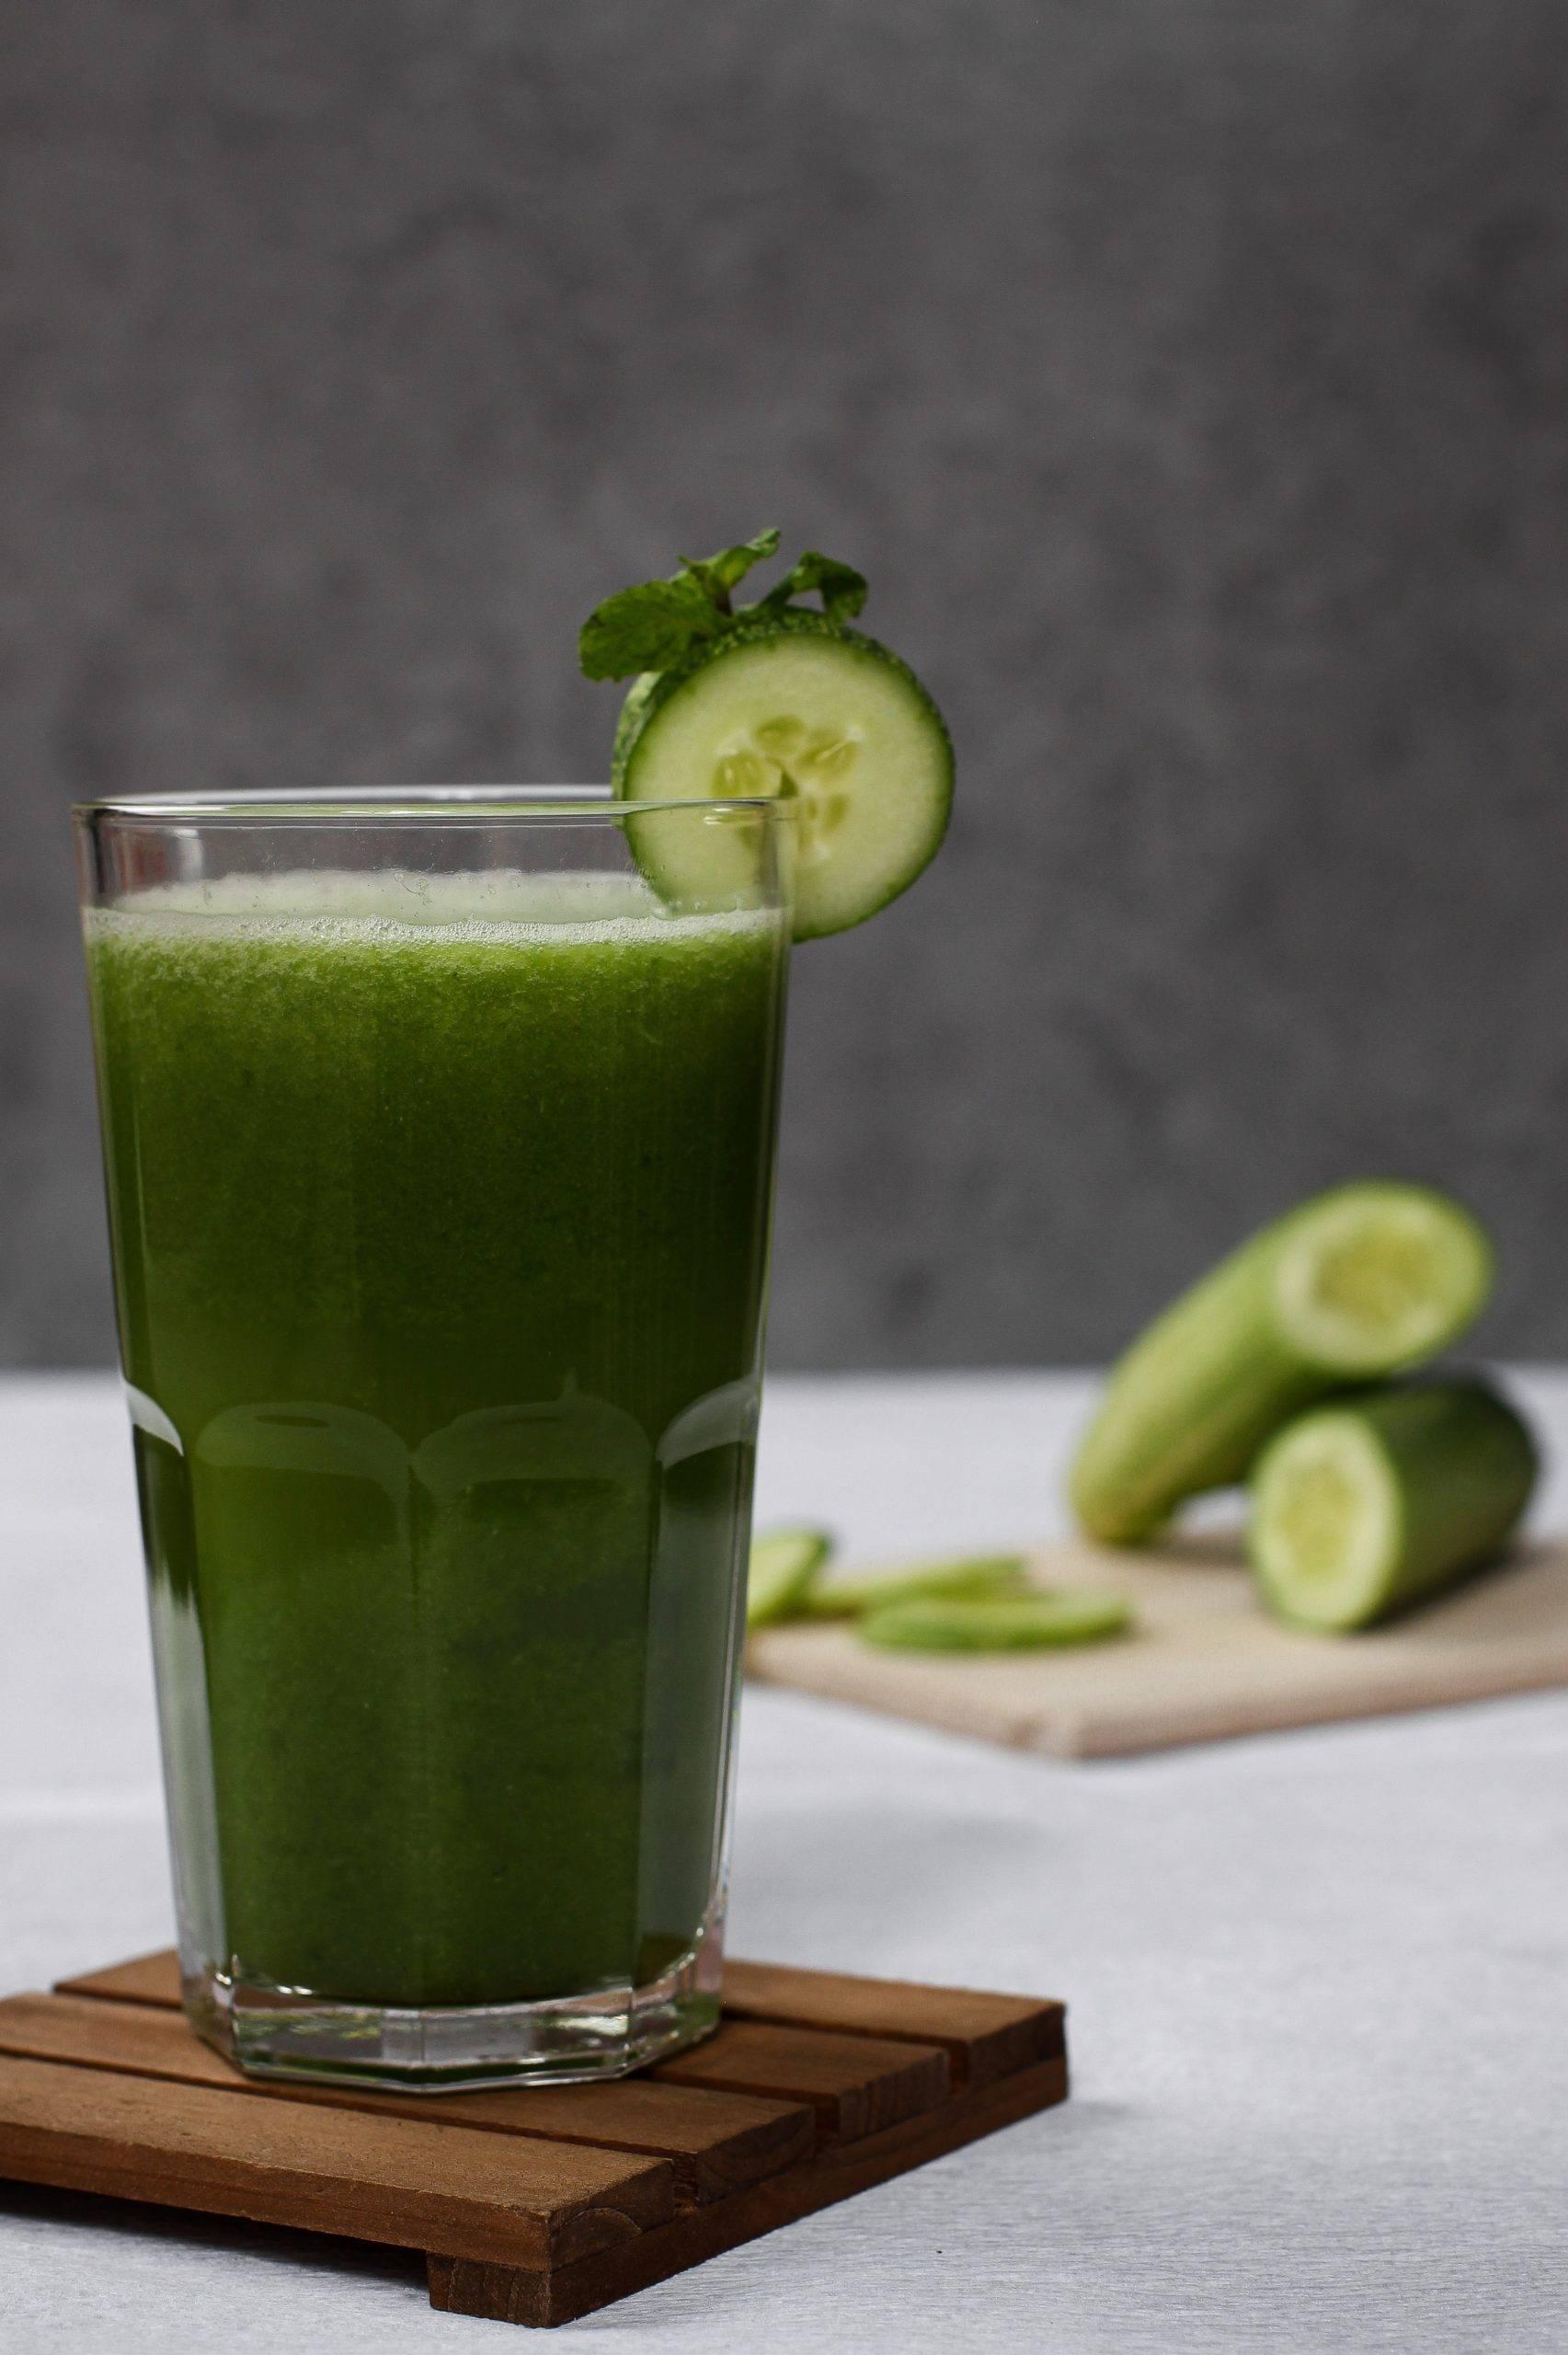 Fresh-pressed Morning Green Juice